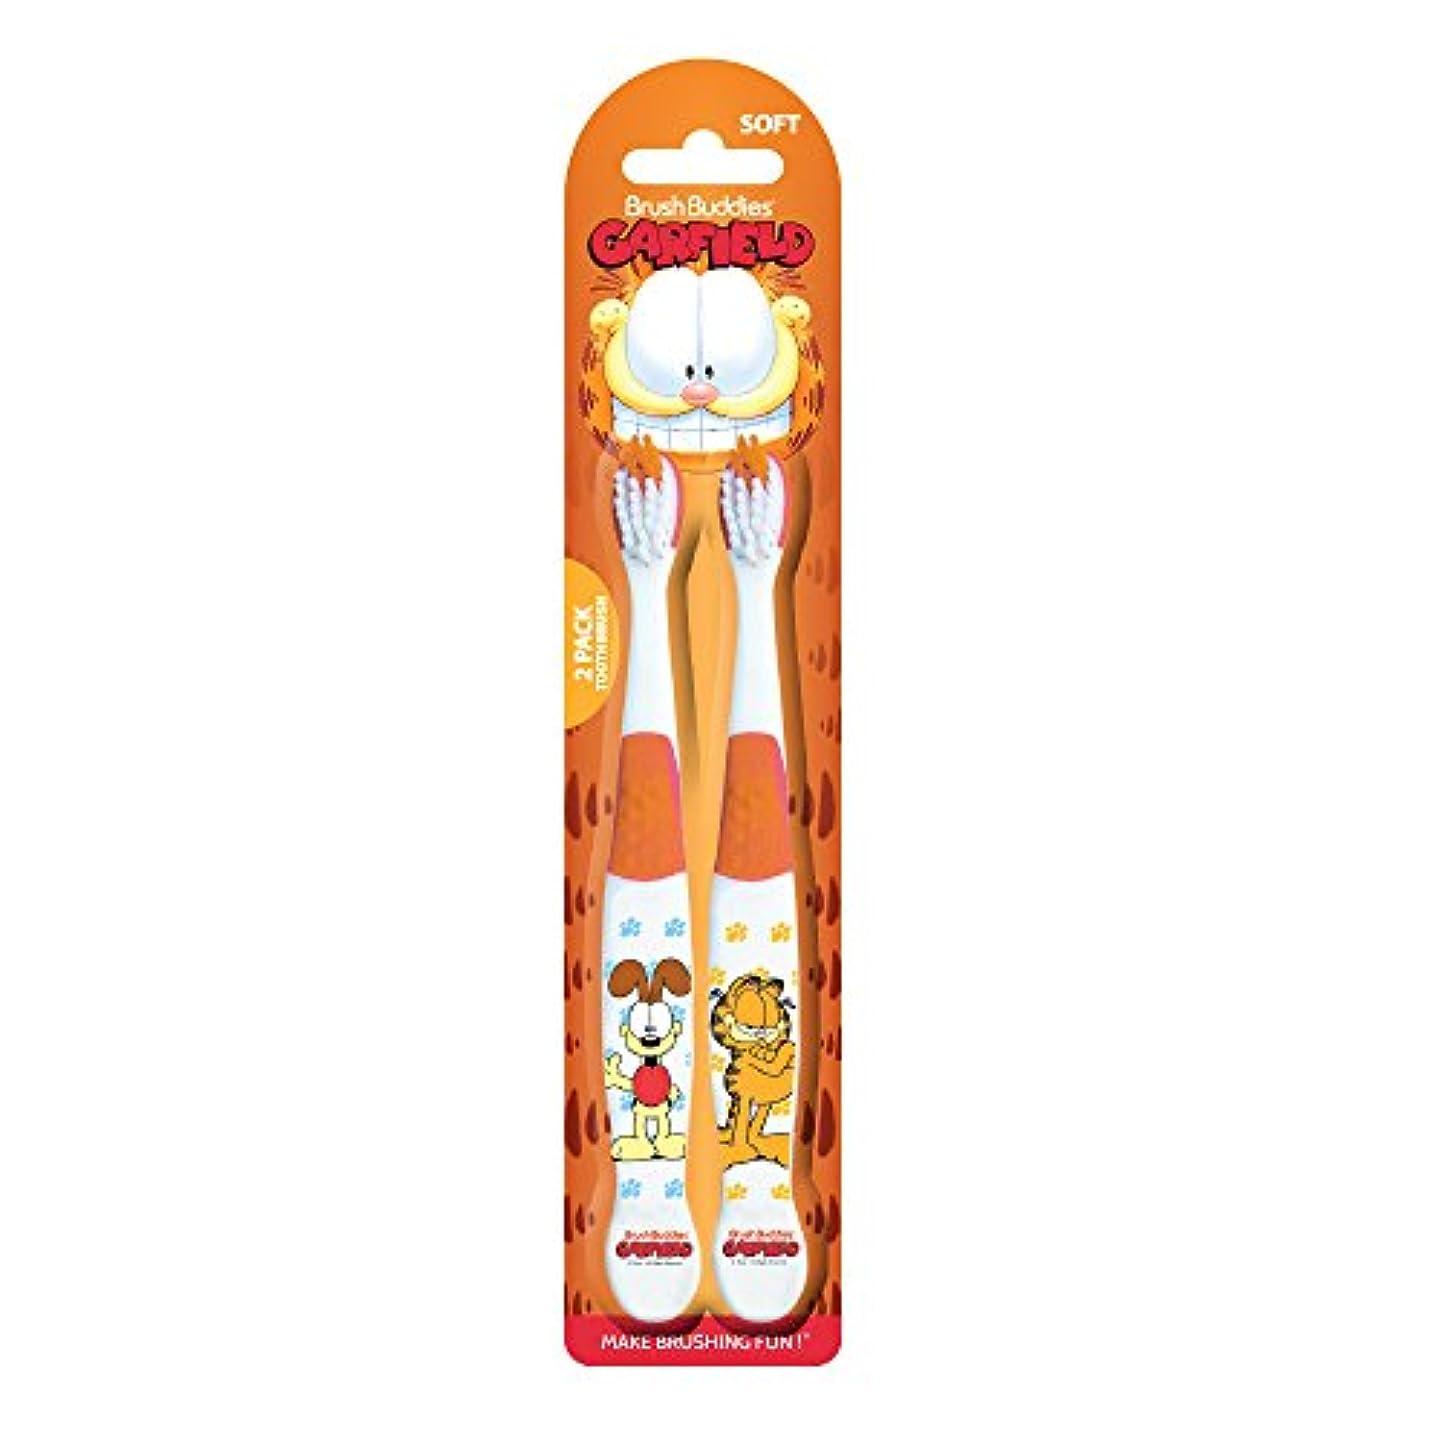 Brush Buddies ガーフィールドとオディ歯ブラシ2パック